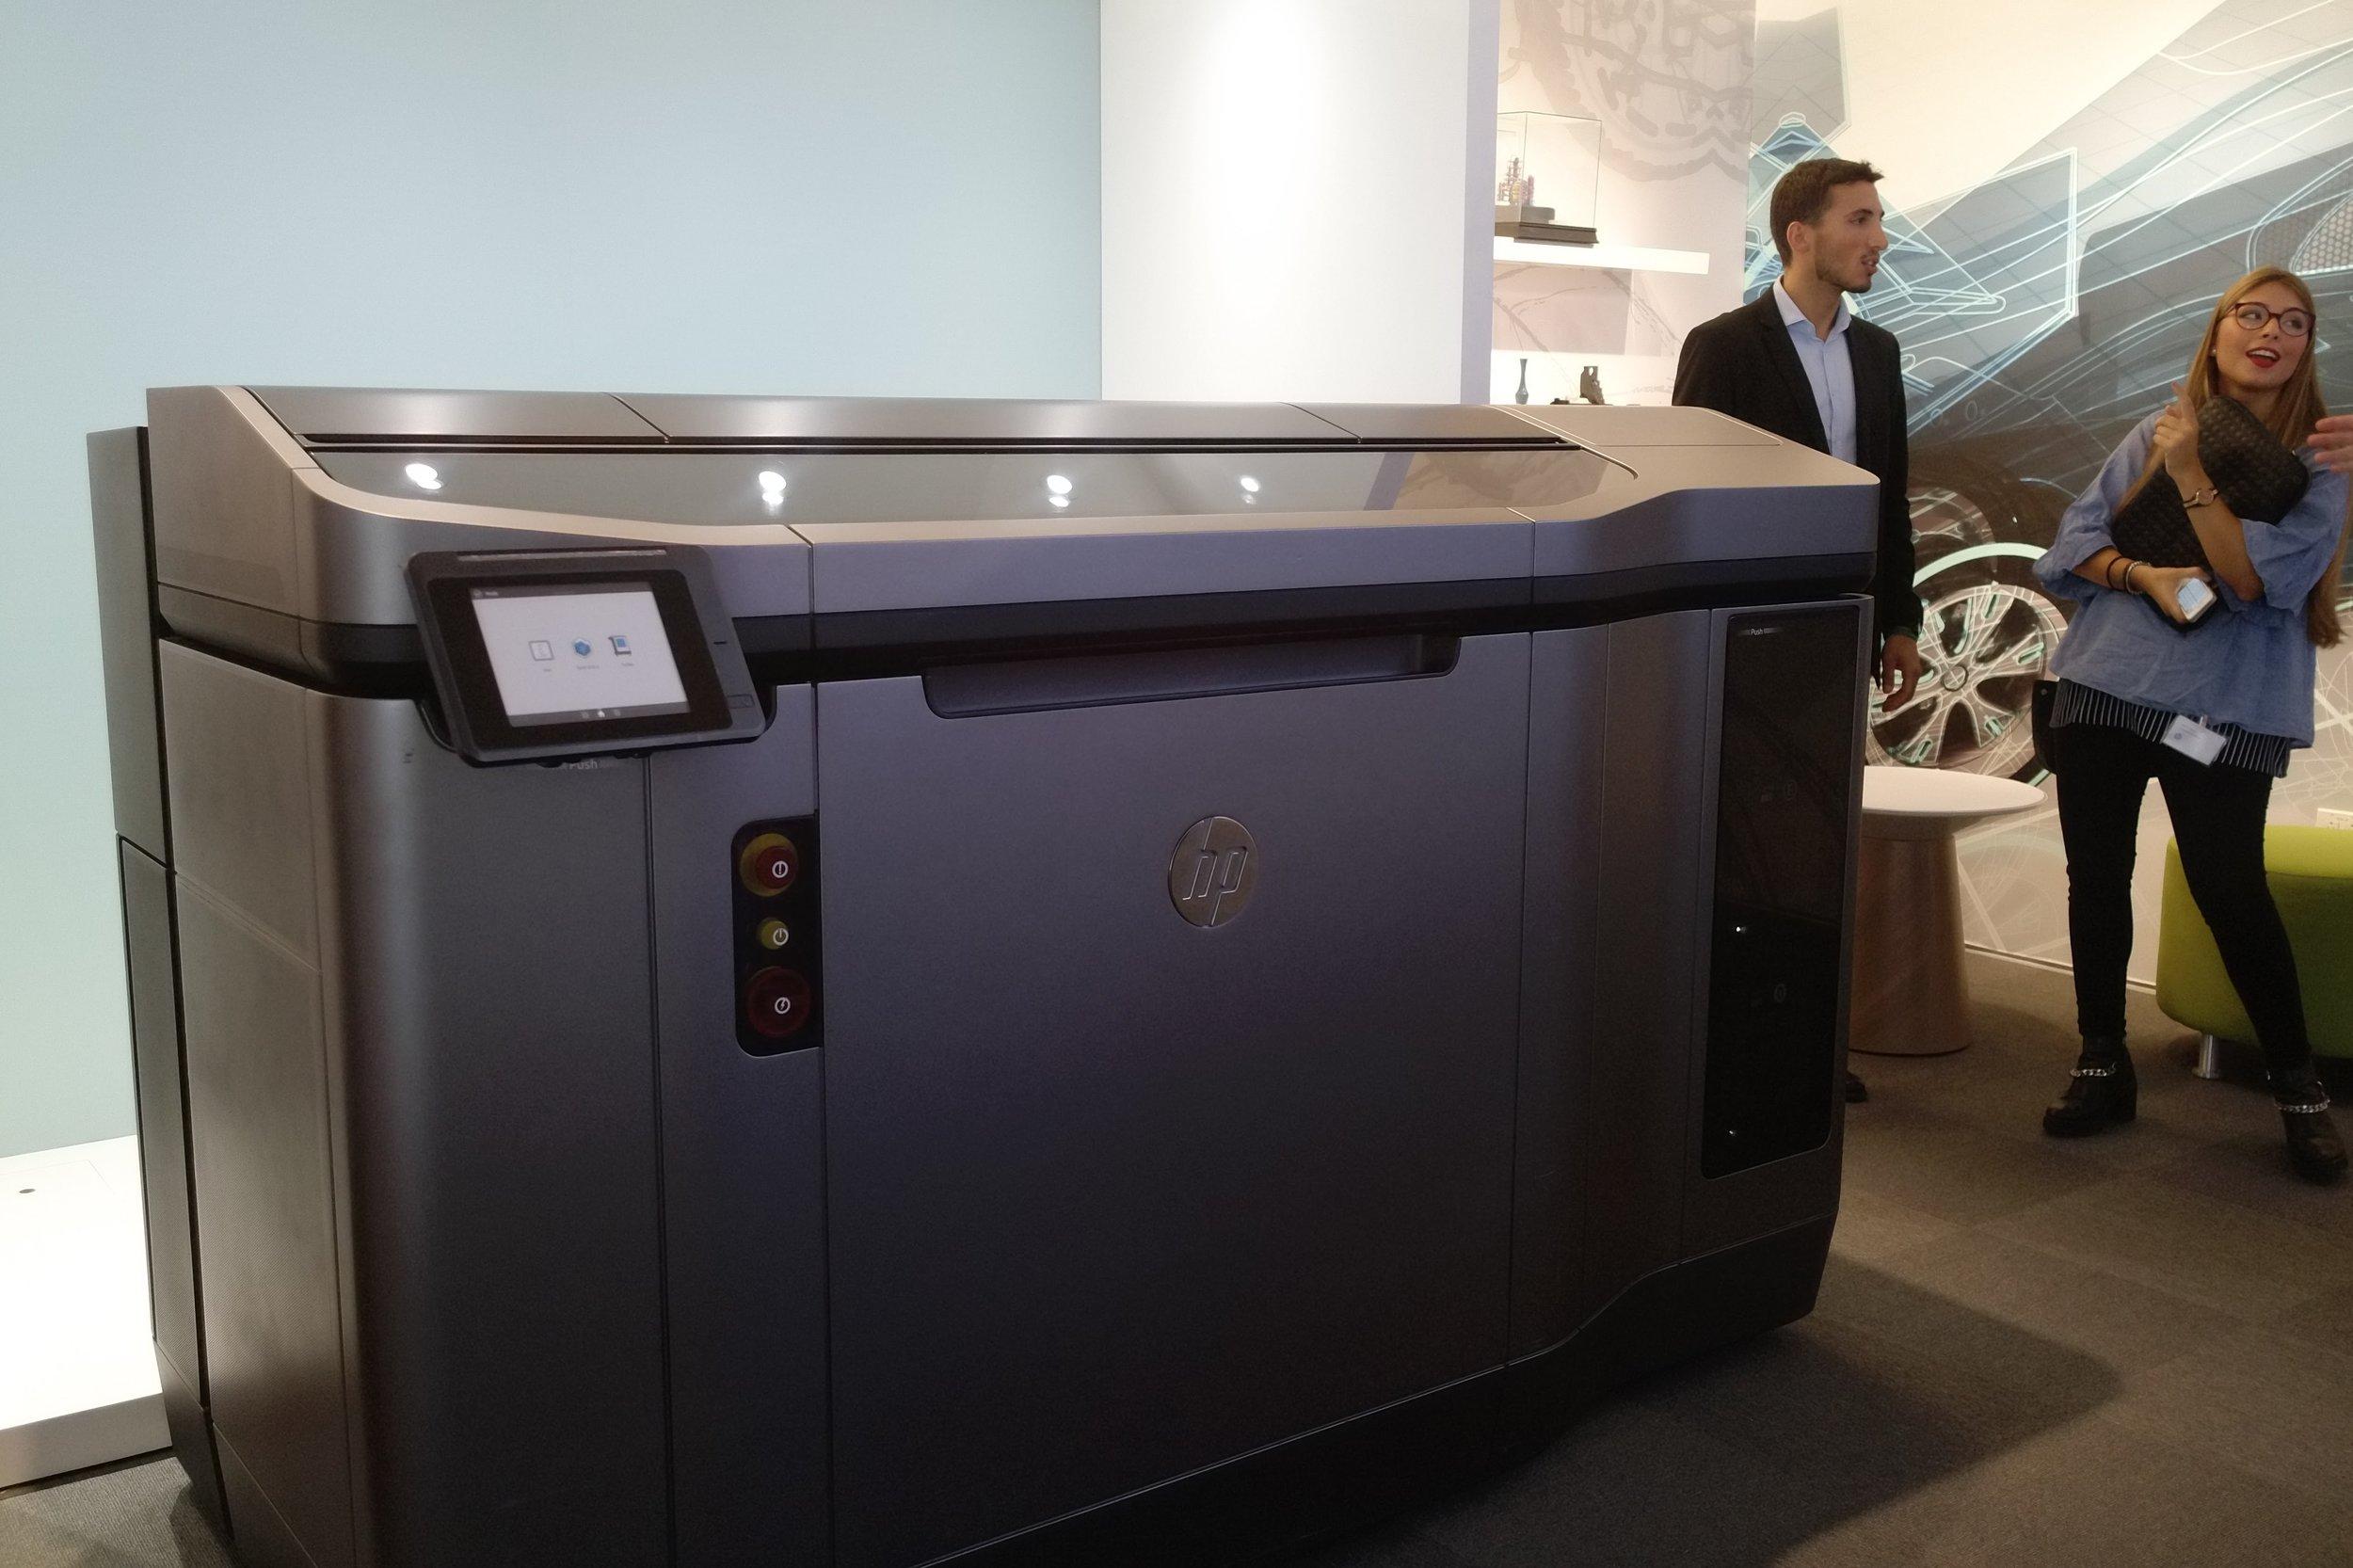 HP Jet Fusion 3-D-Drucker.